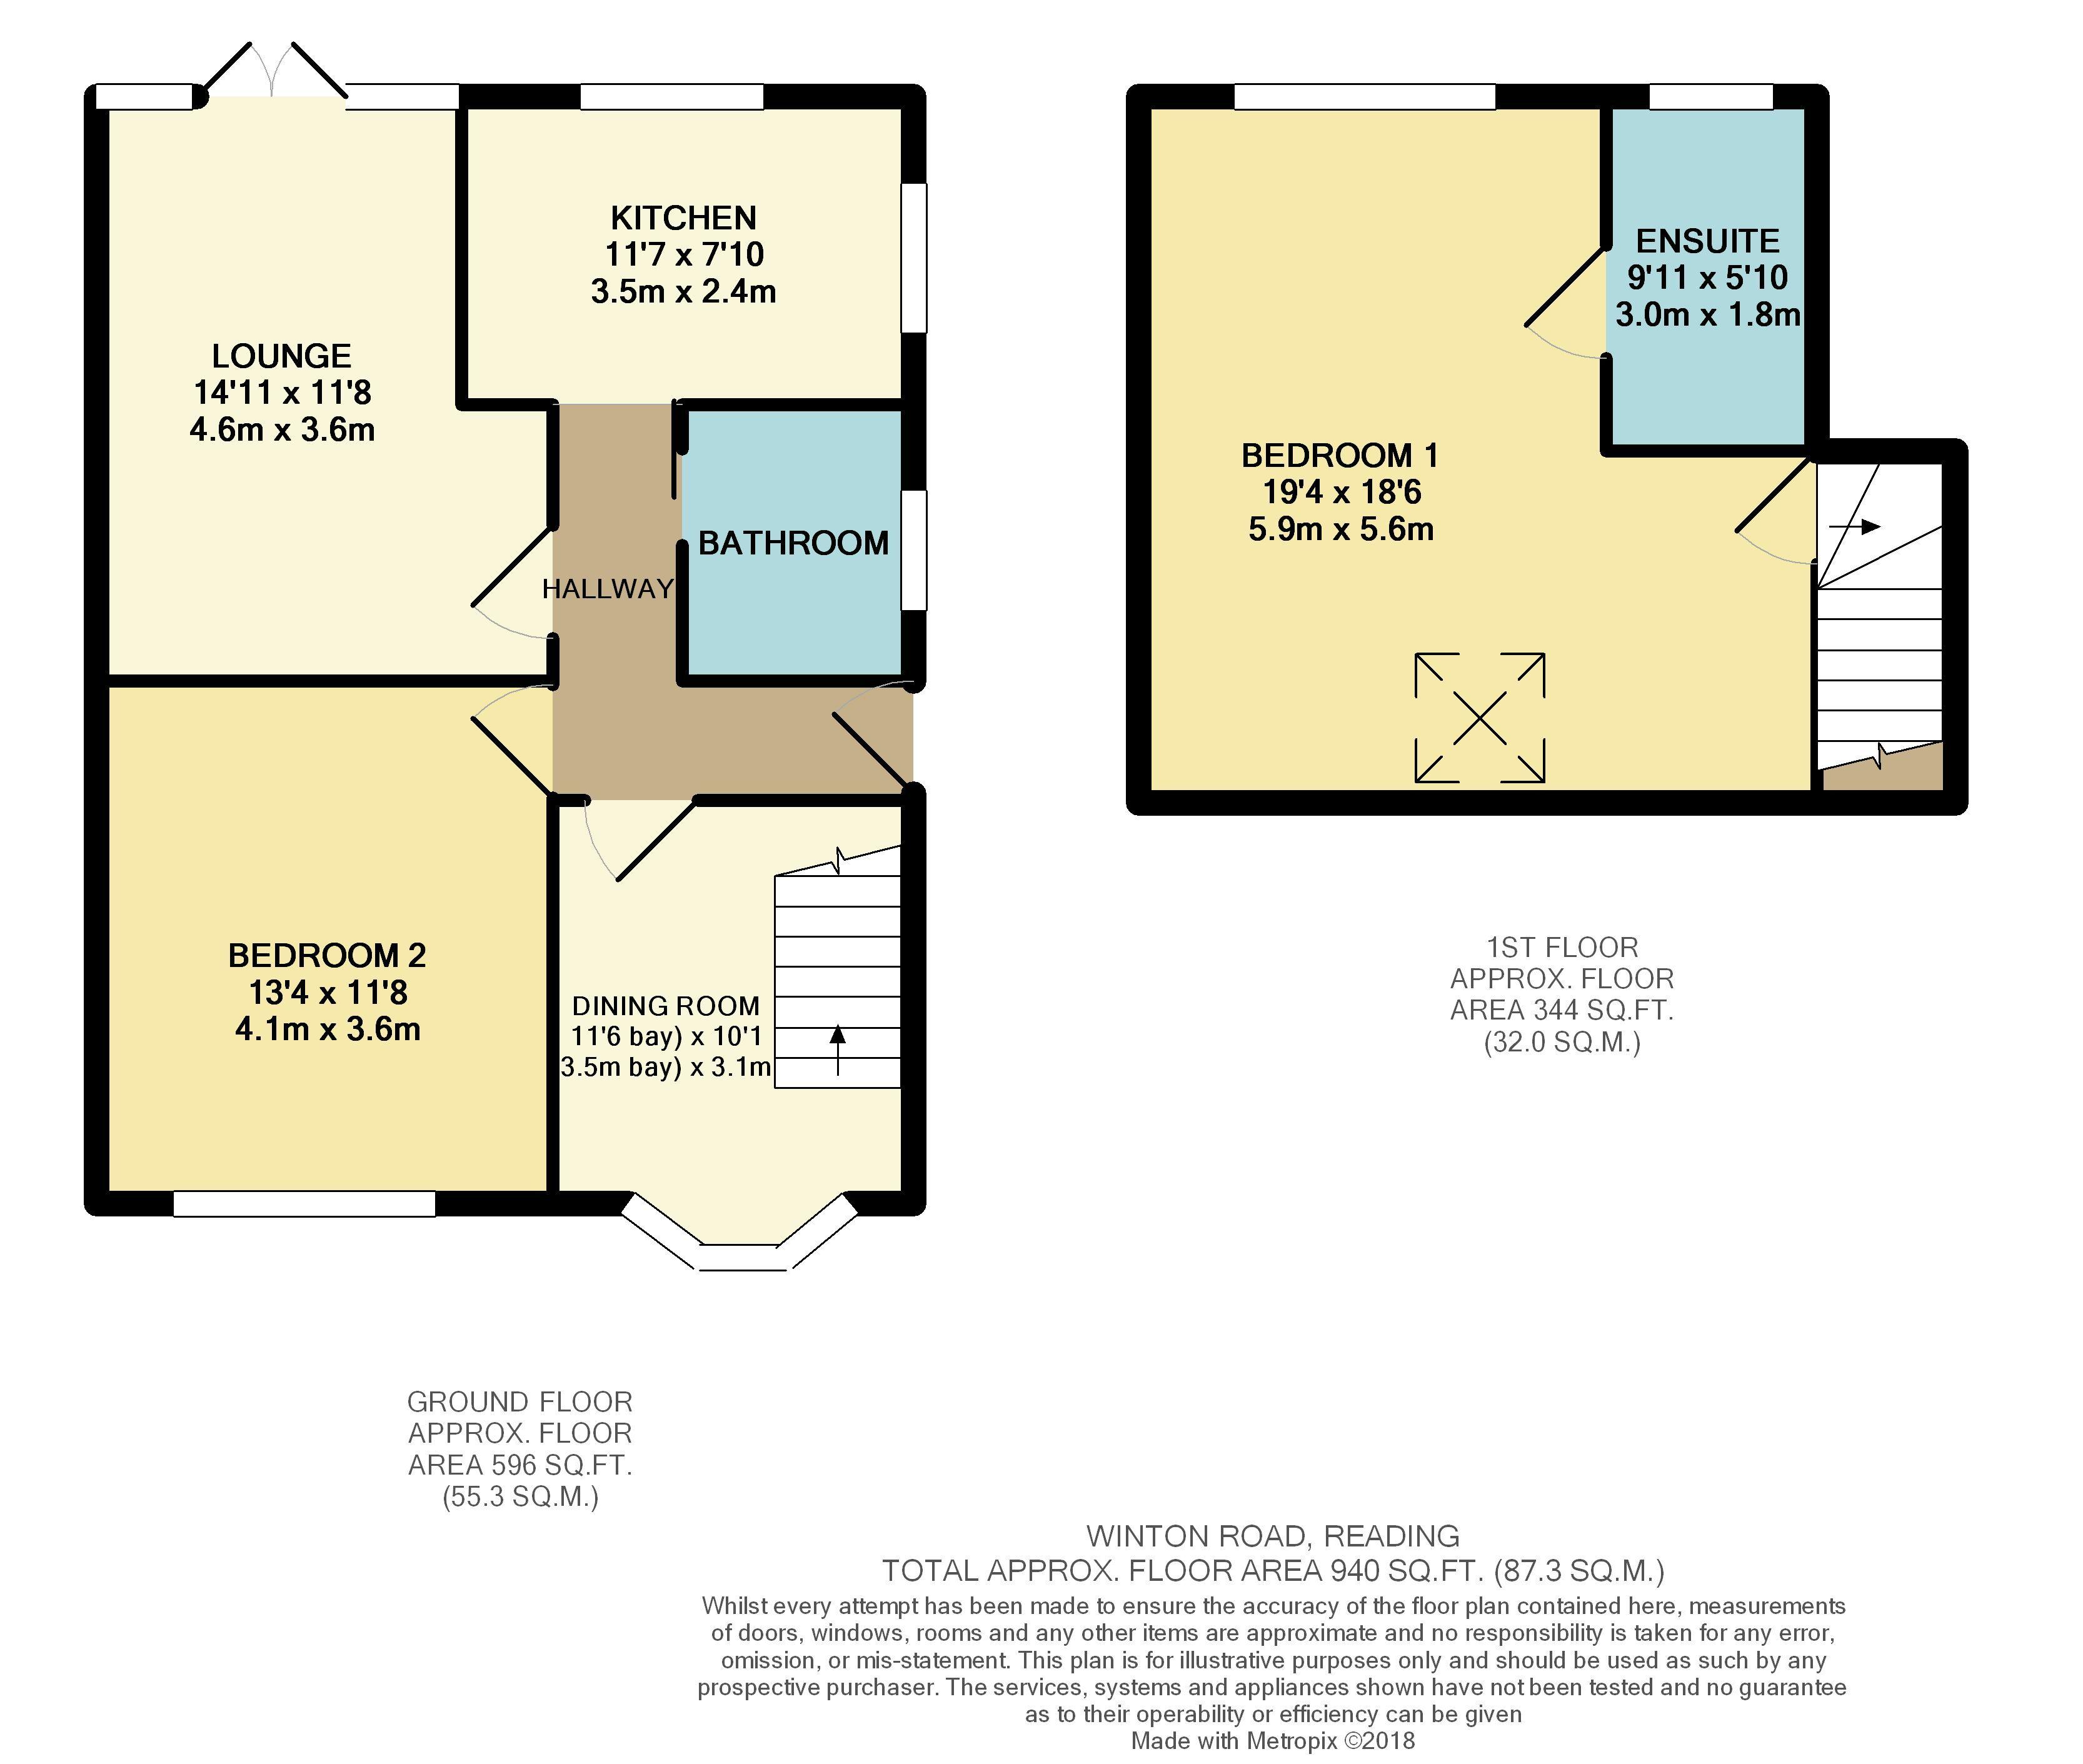 Winton road reading rg2 2 bedroom semi detached bungalow for Reading a floor plan